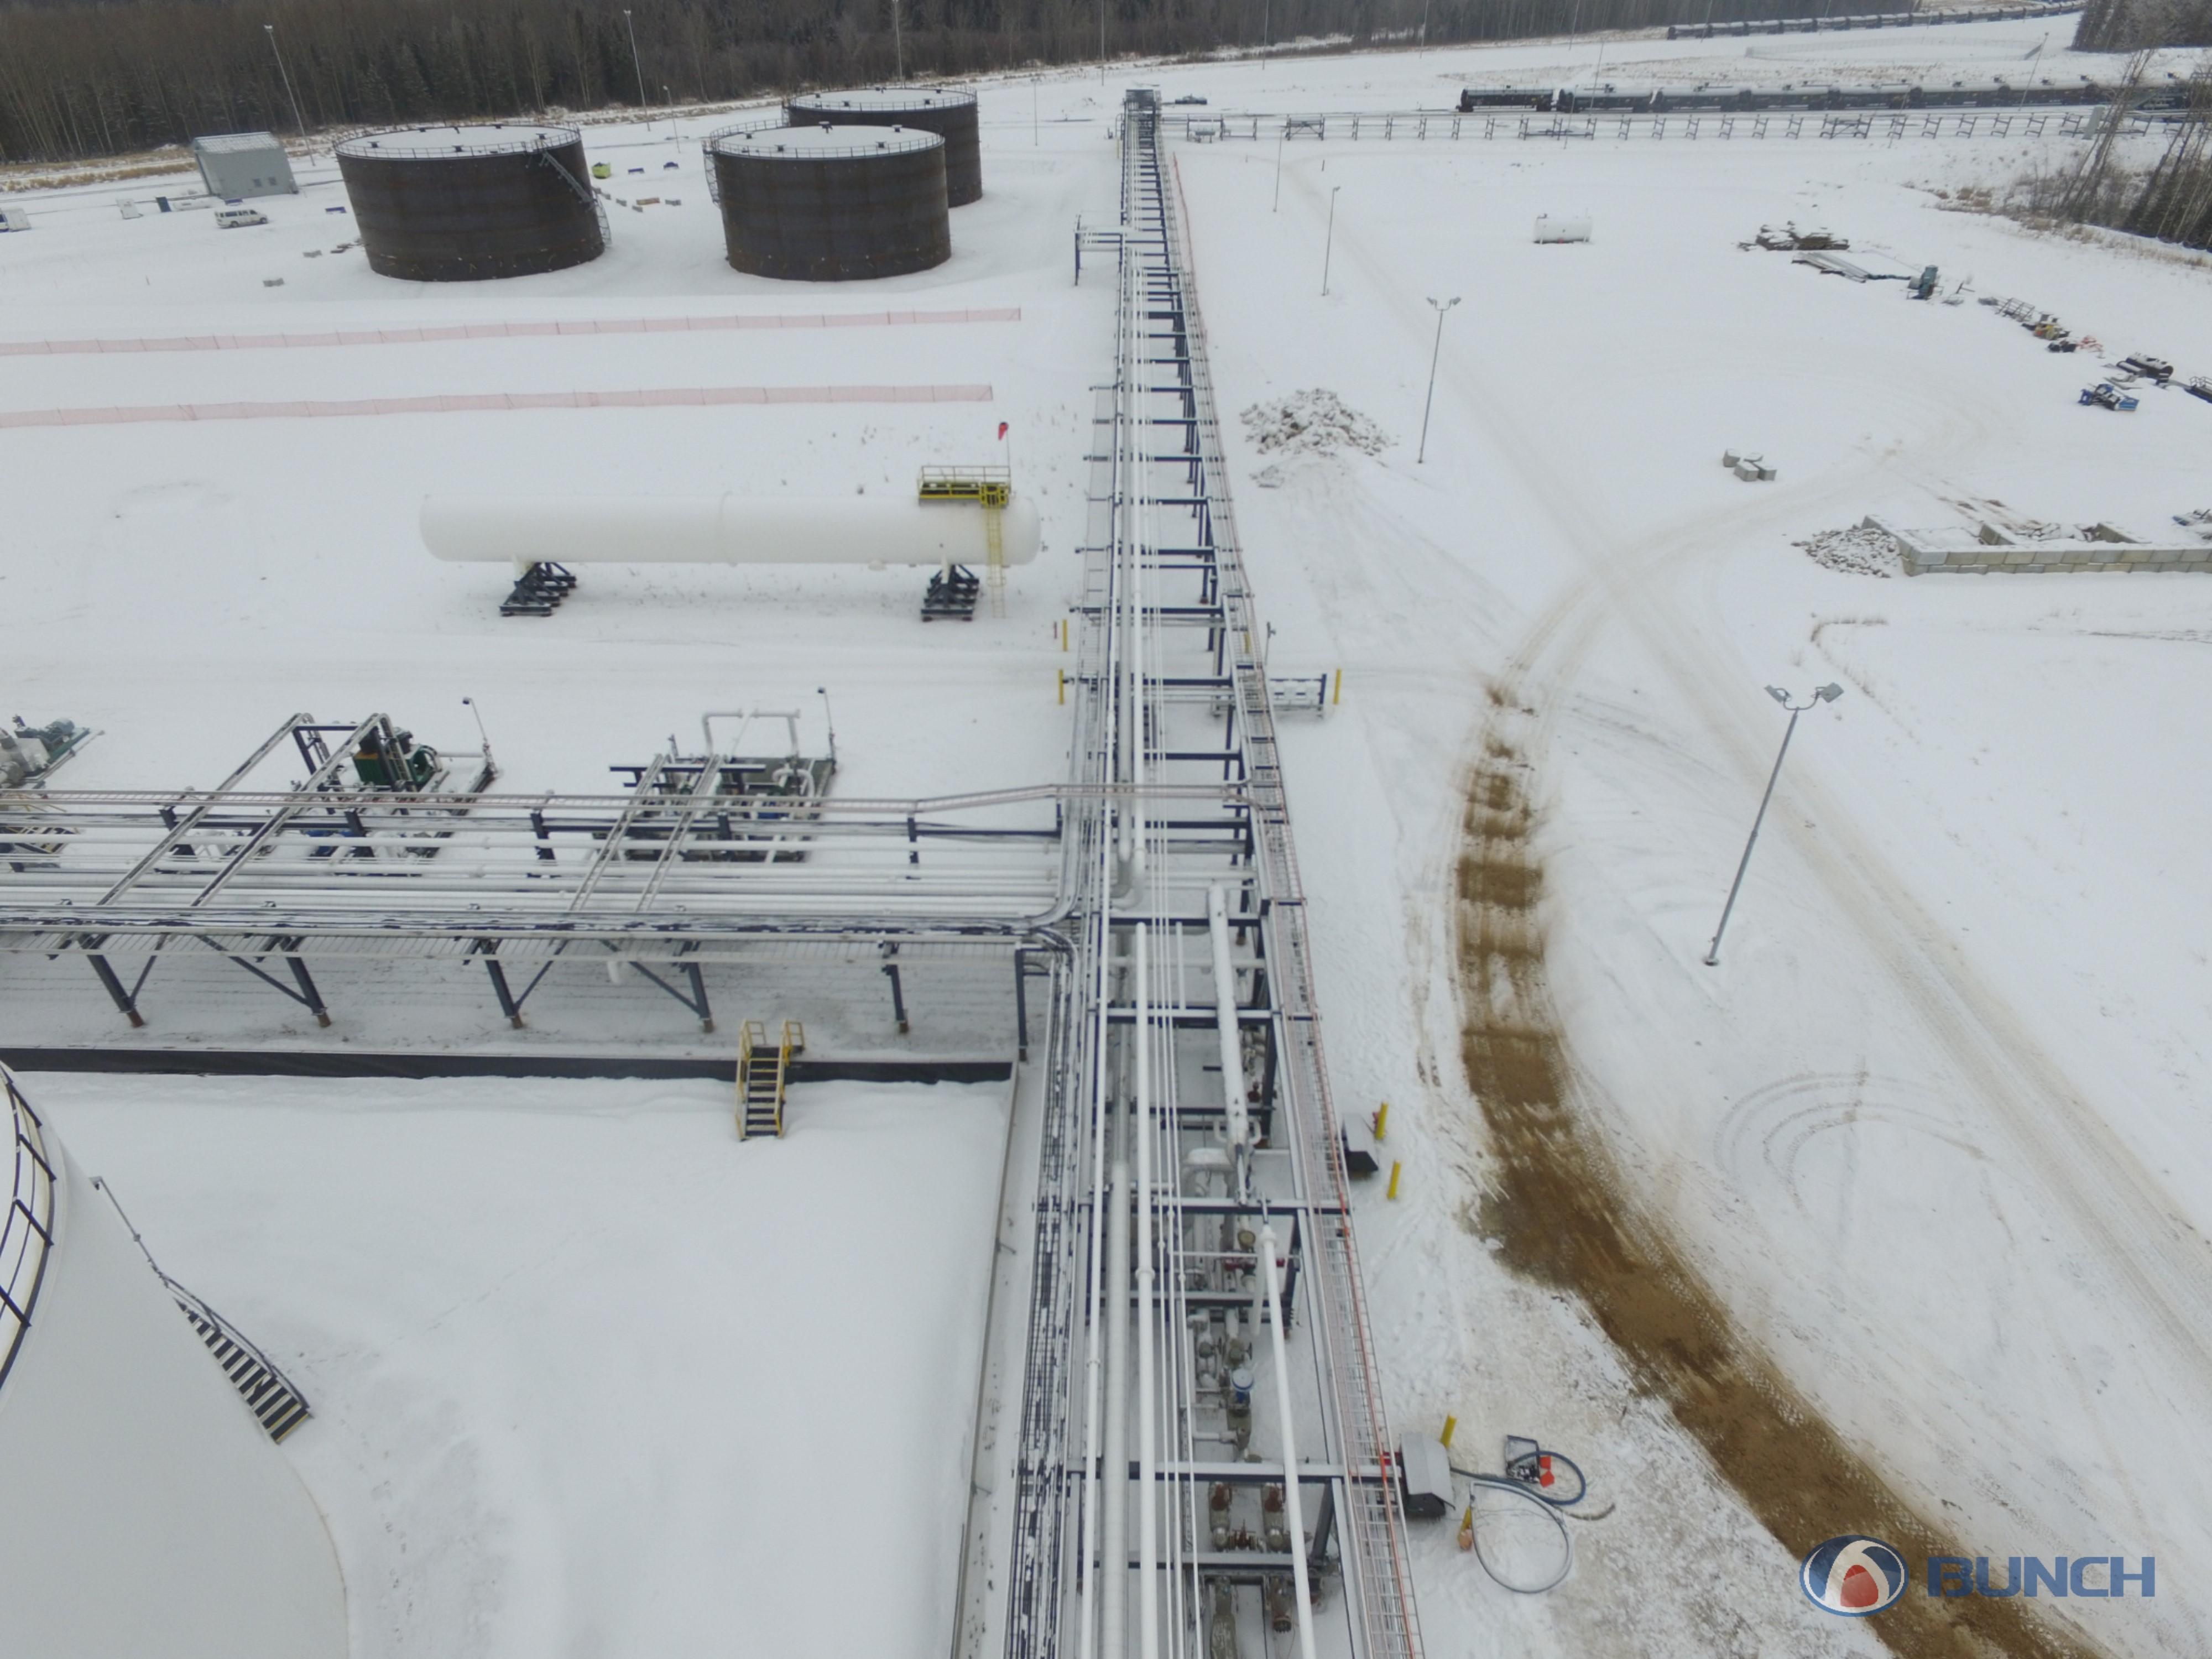 Bunch Rail Terminal Construction in Alberta